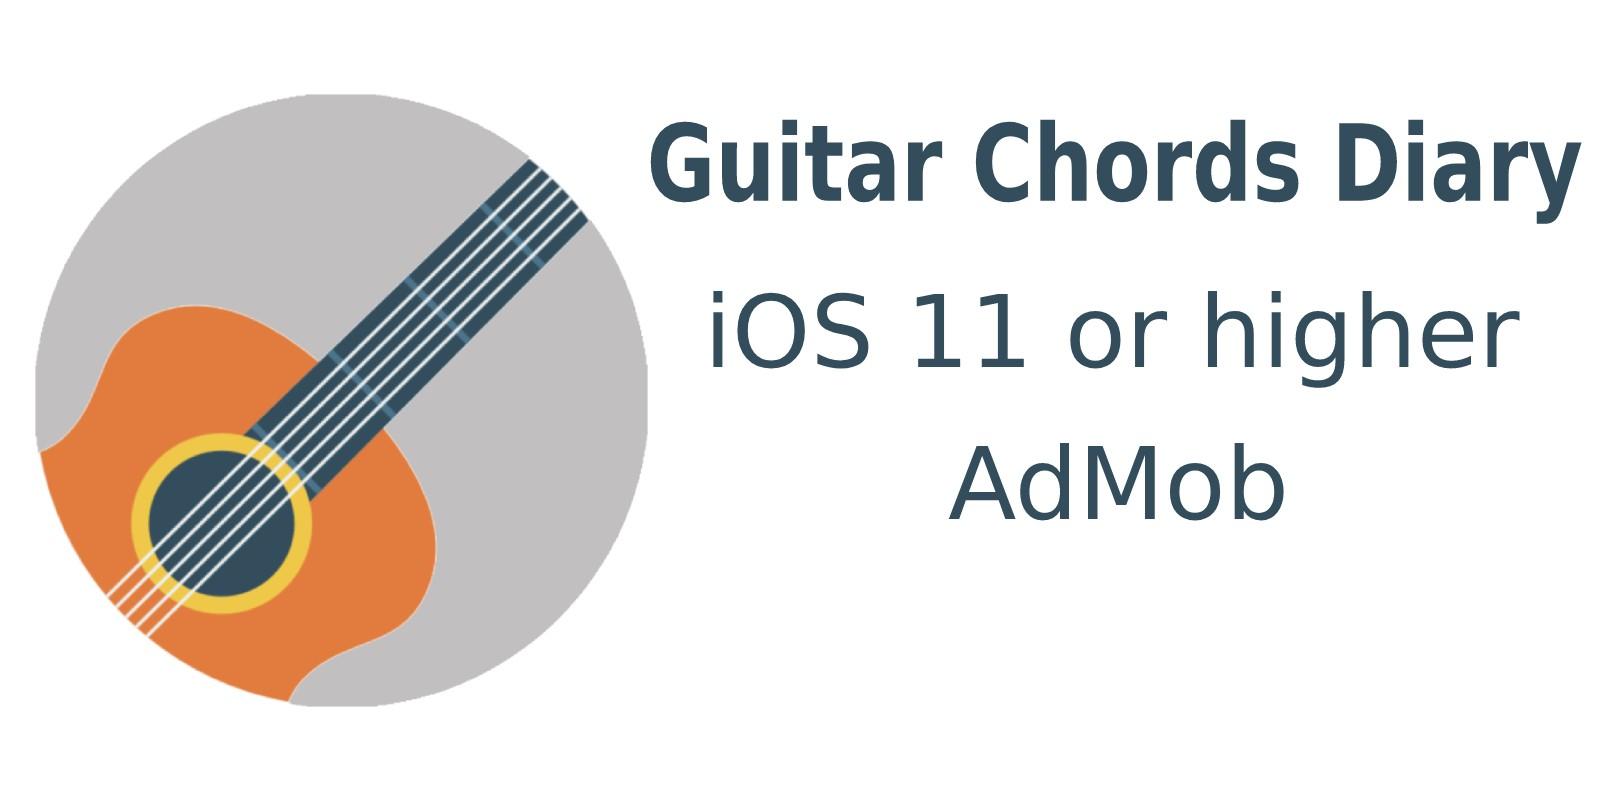 Guitar Chords Diary - iOS Source Code